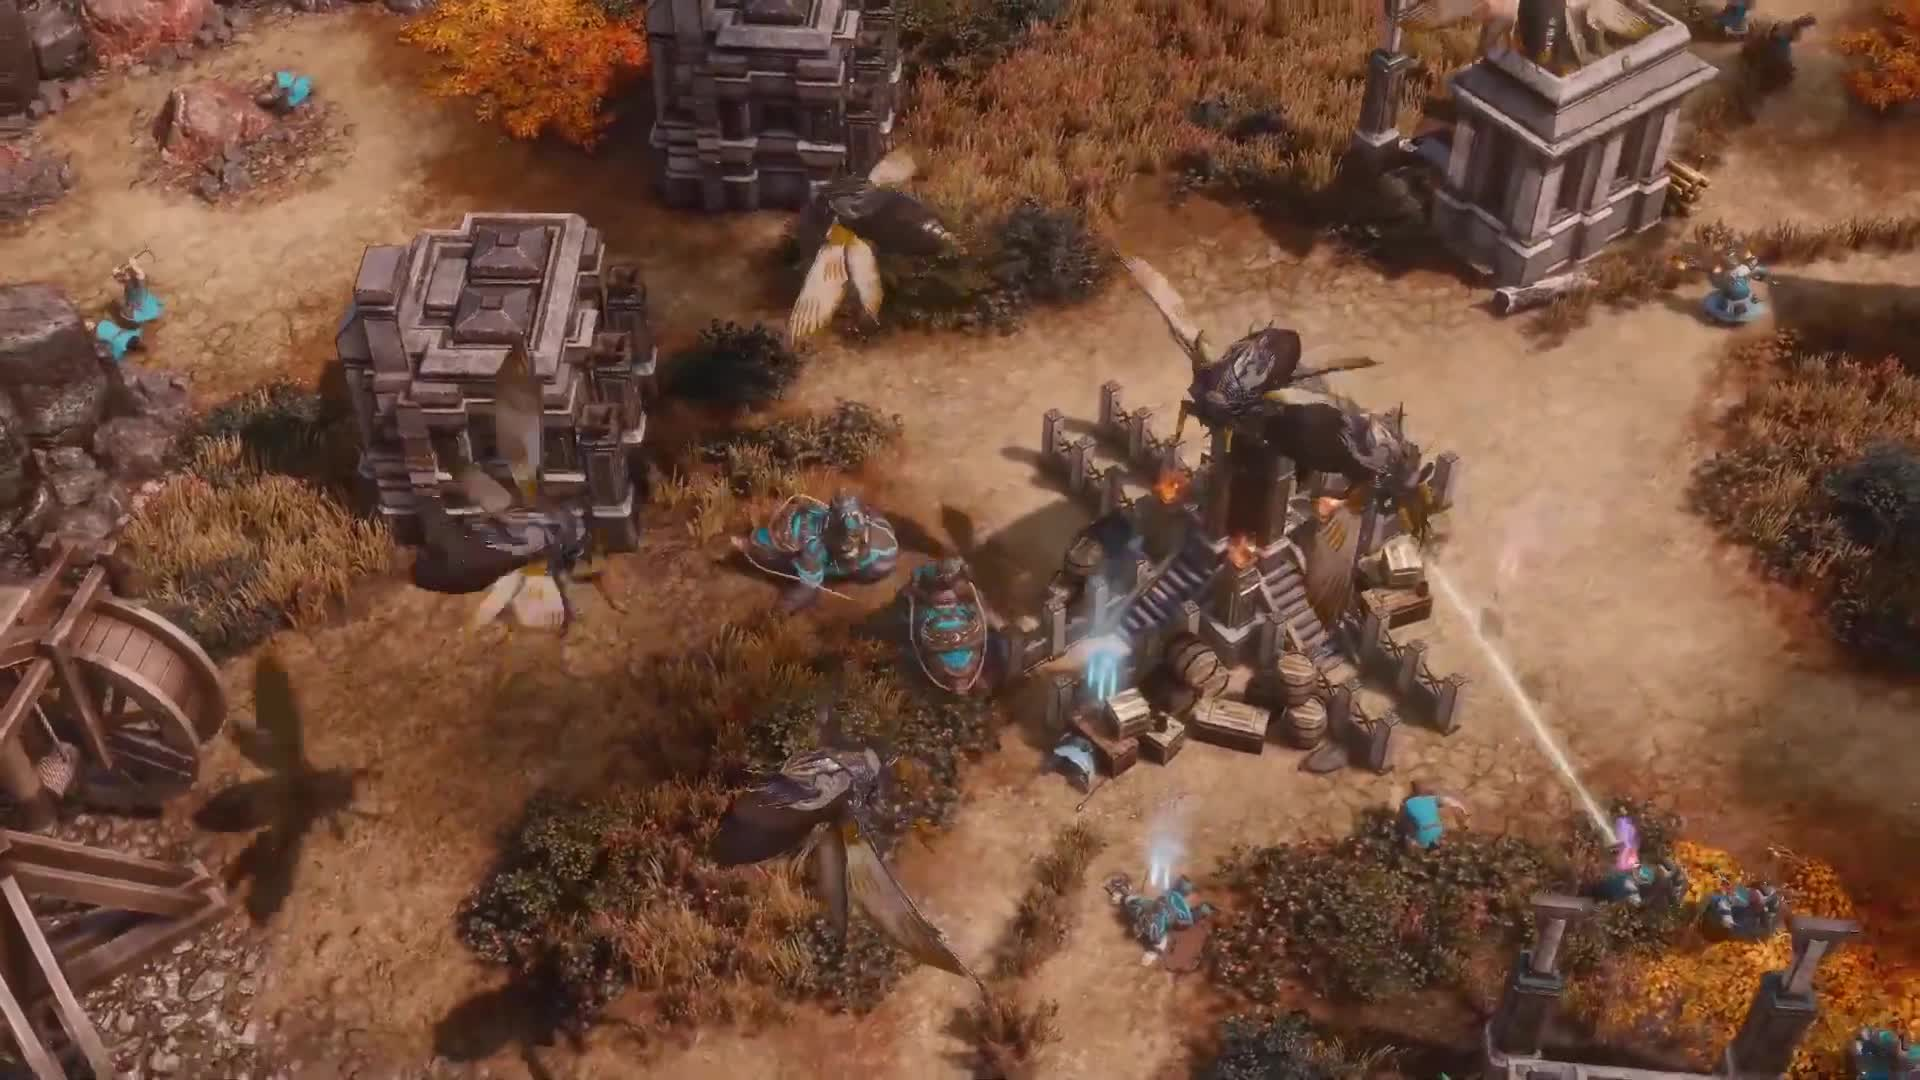 Trailer, Rollenspiel, Strategiespiel, Erweiterung, THQ Nordic, SpellForce, Spellforce 3, Soul Harvest, Grimlore Games